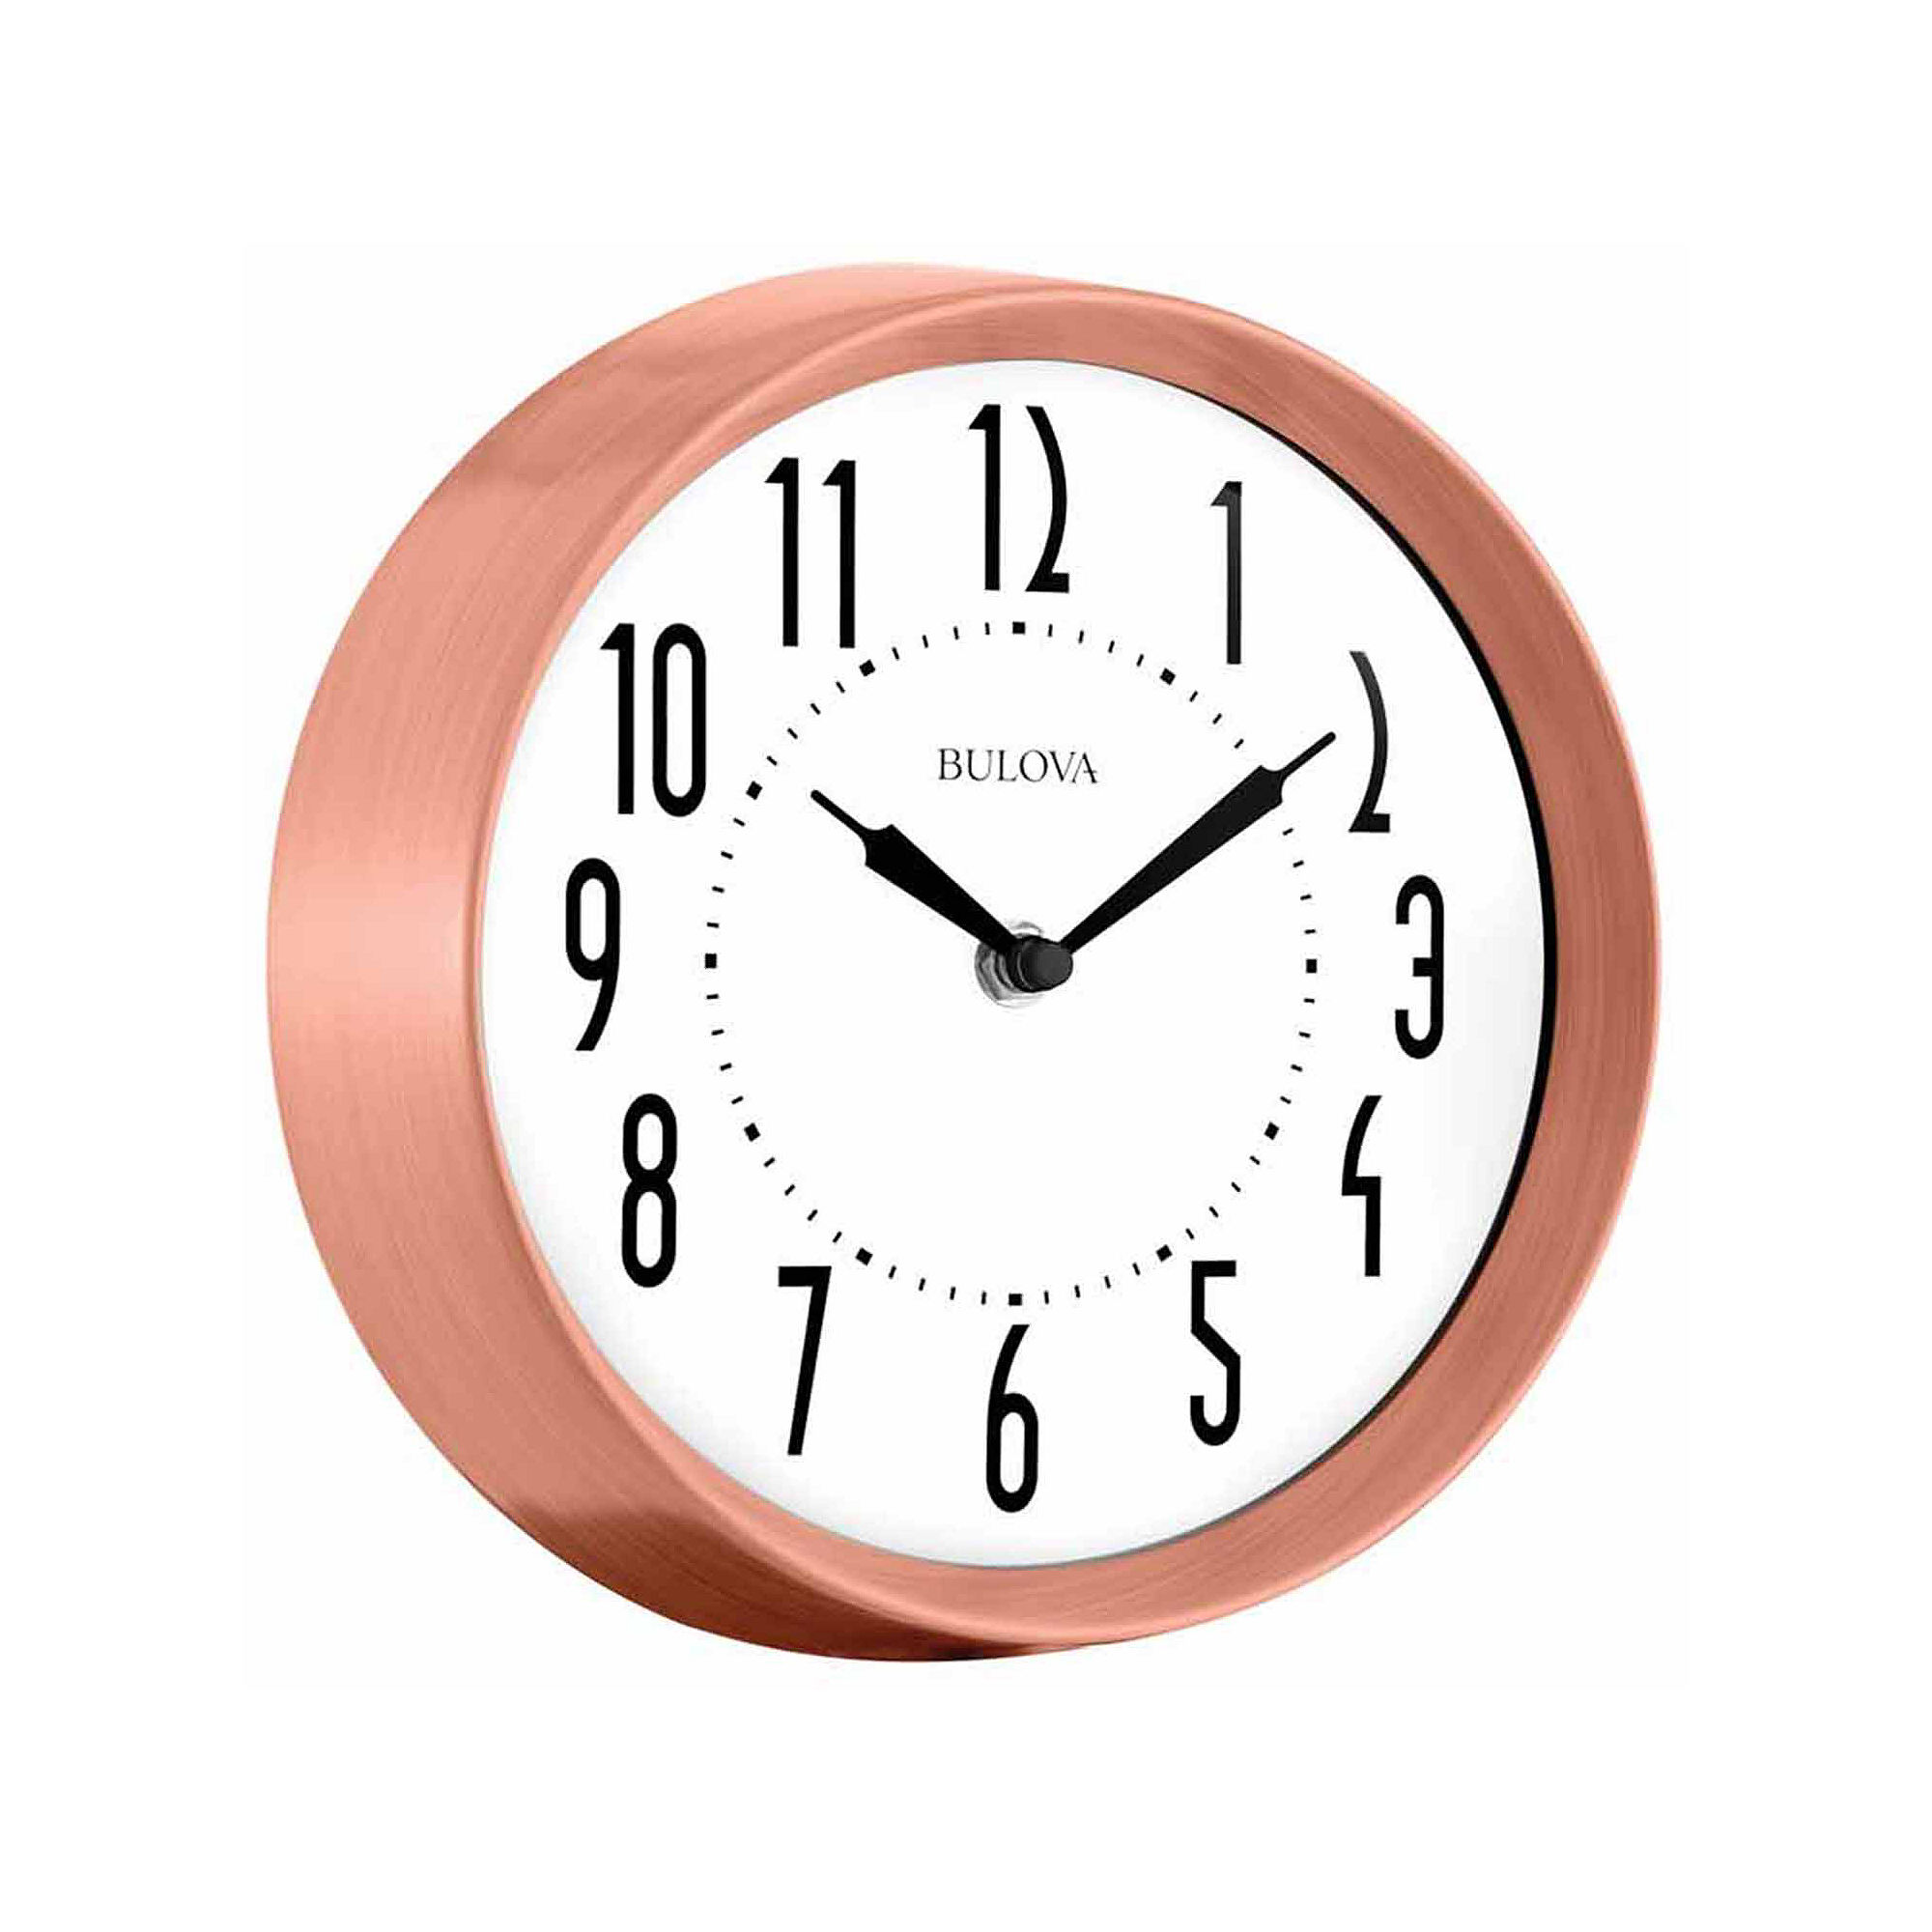 Bulova Cleaver White Wall Clock-C4828